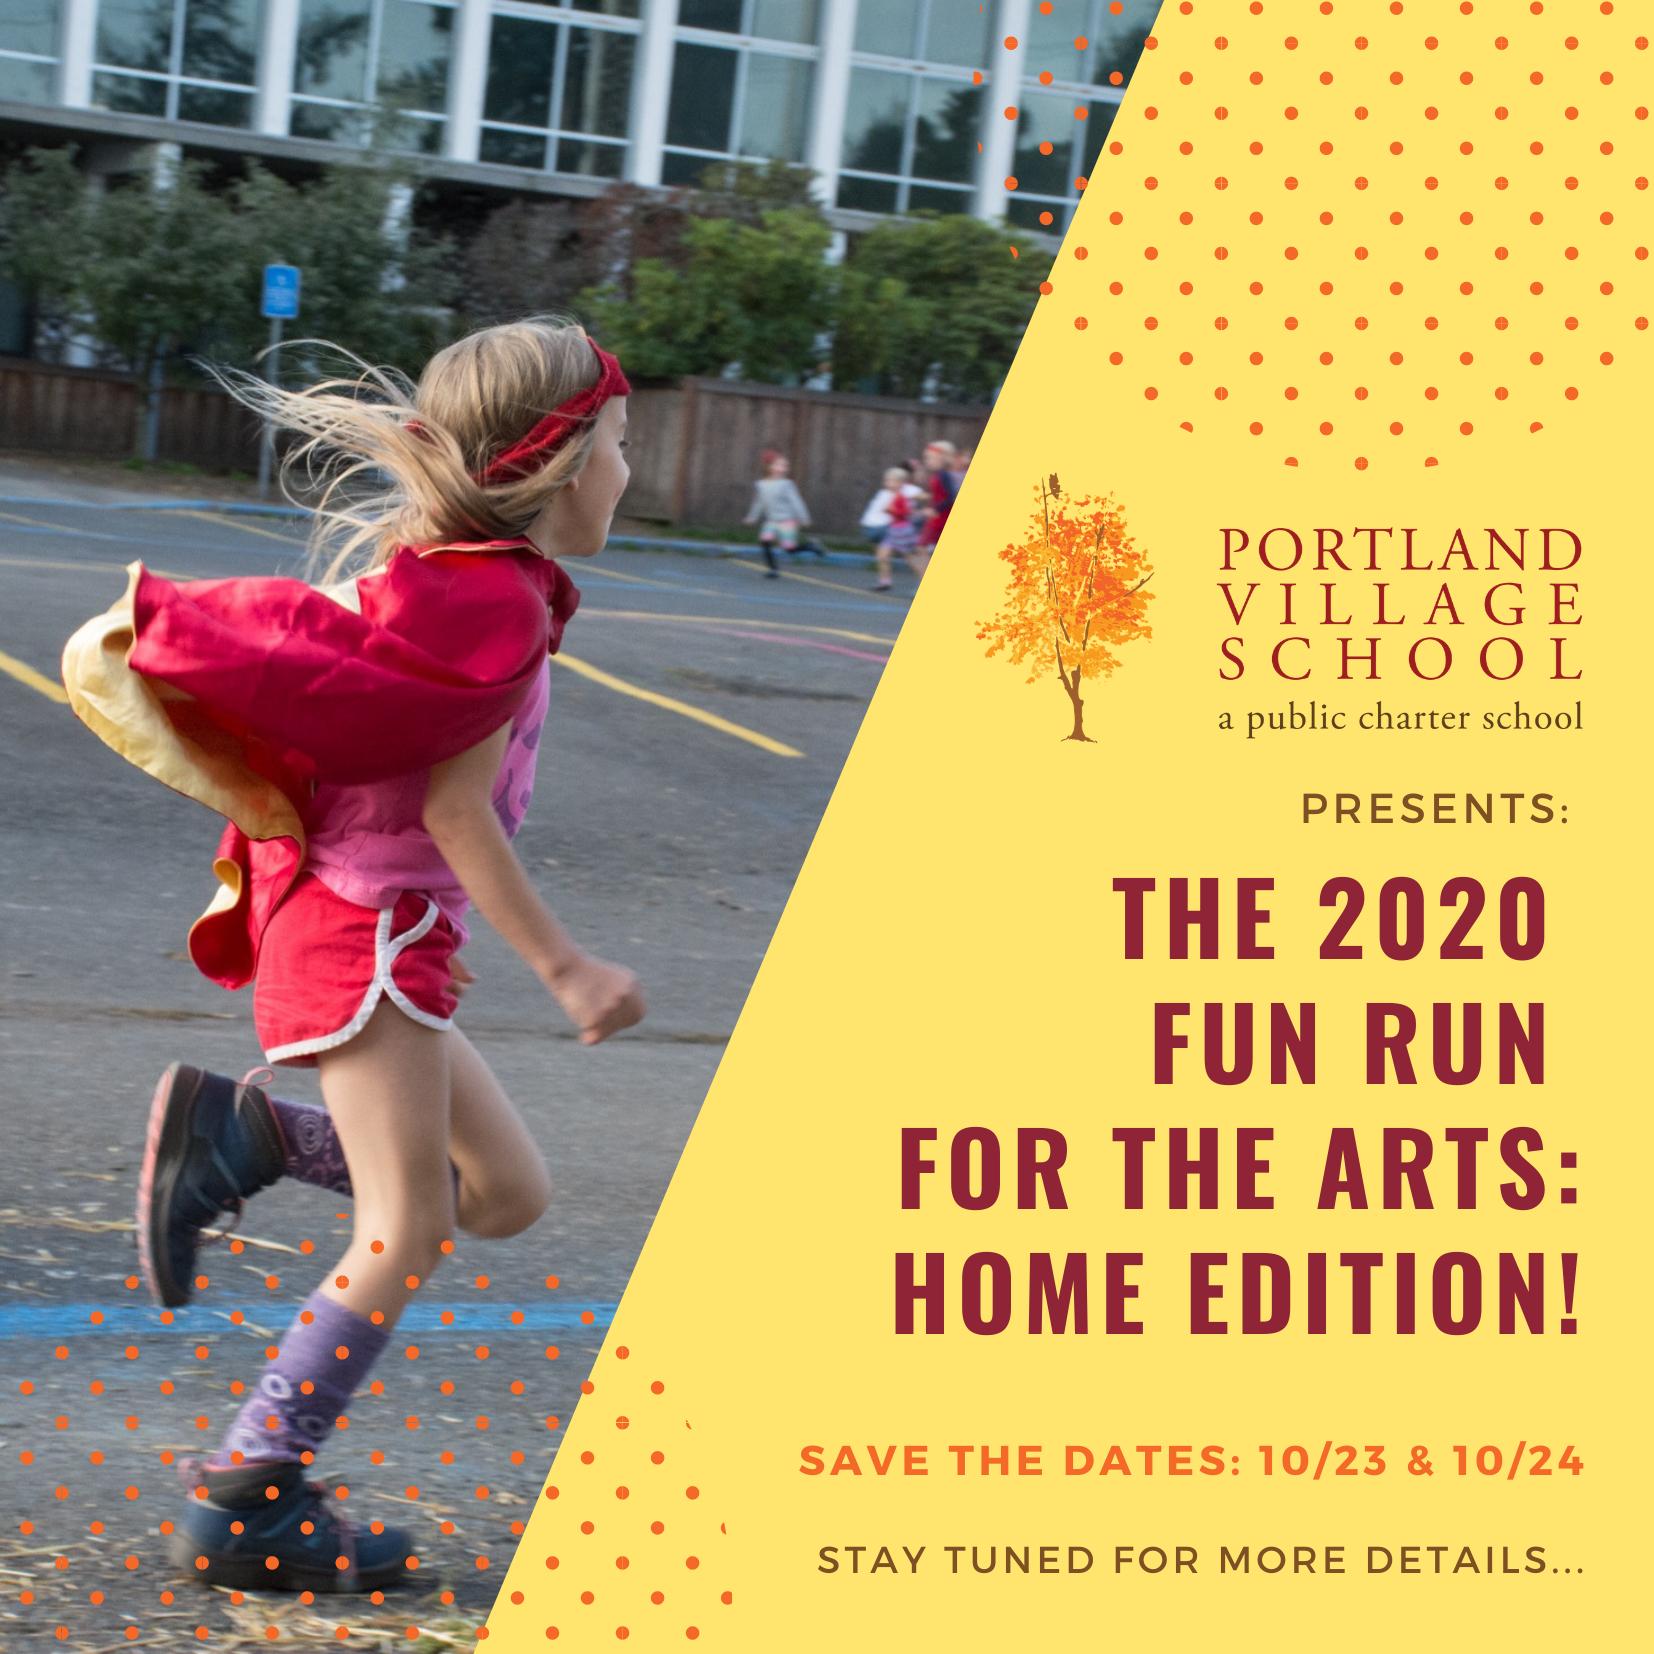 Fun Run for the Arts: Home Edition